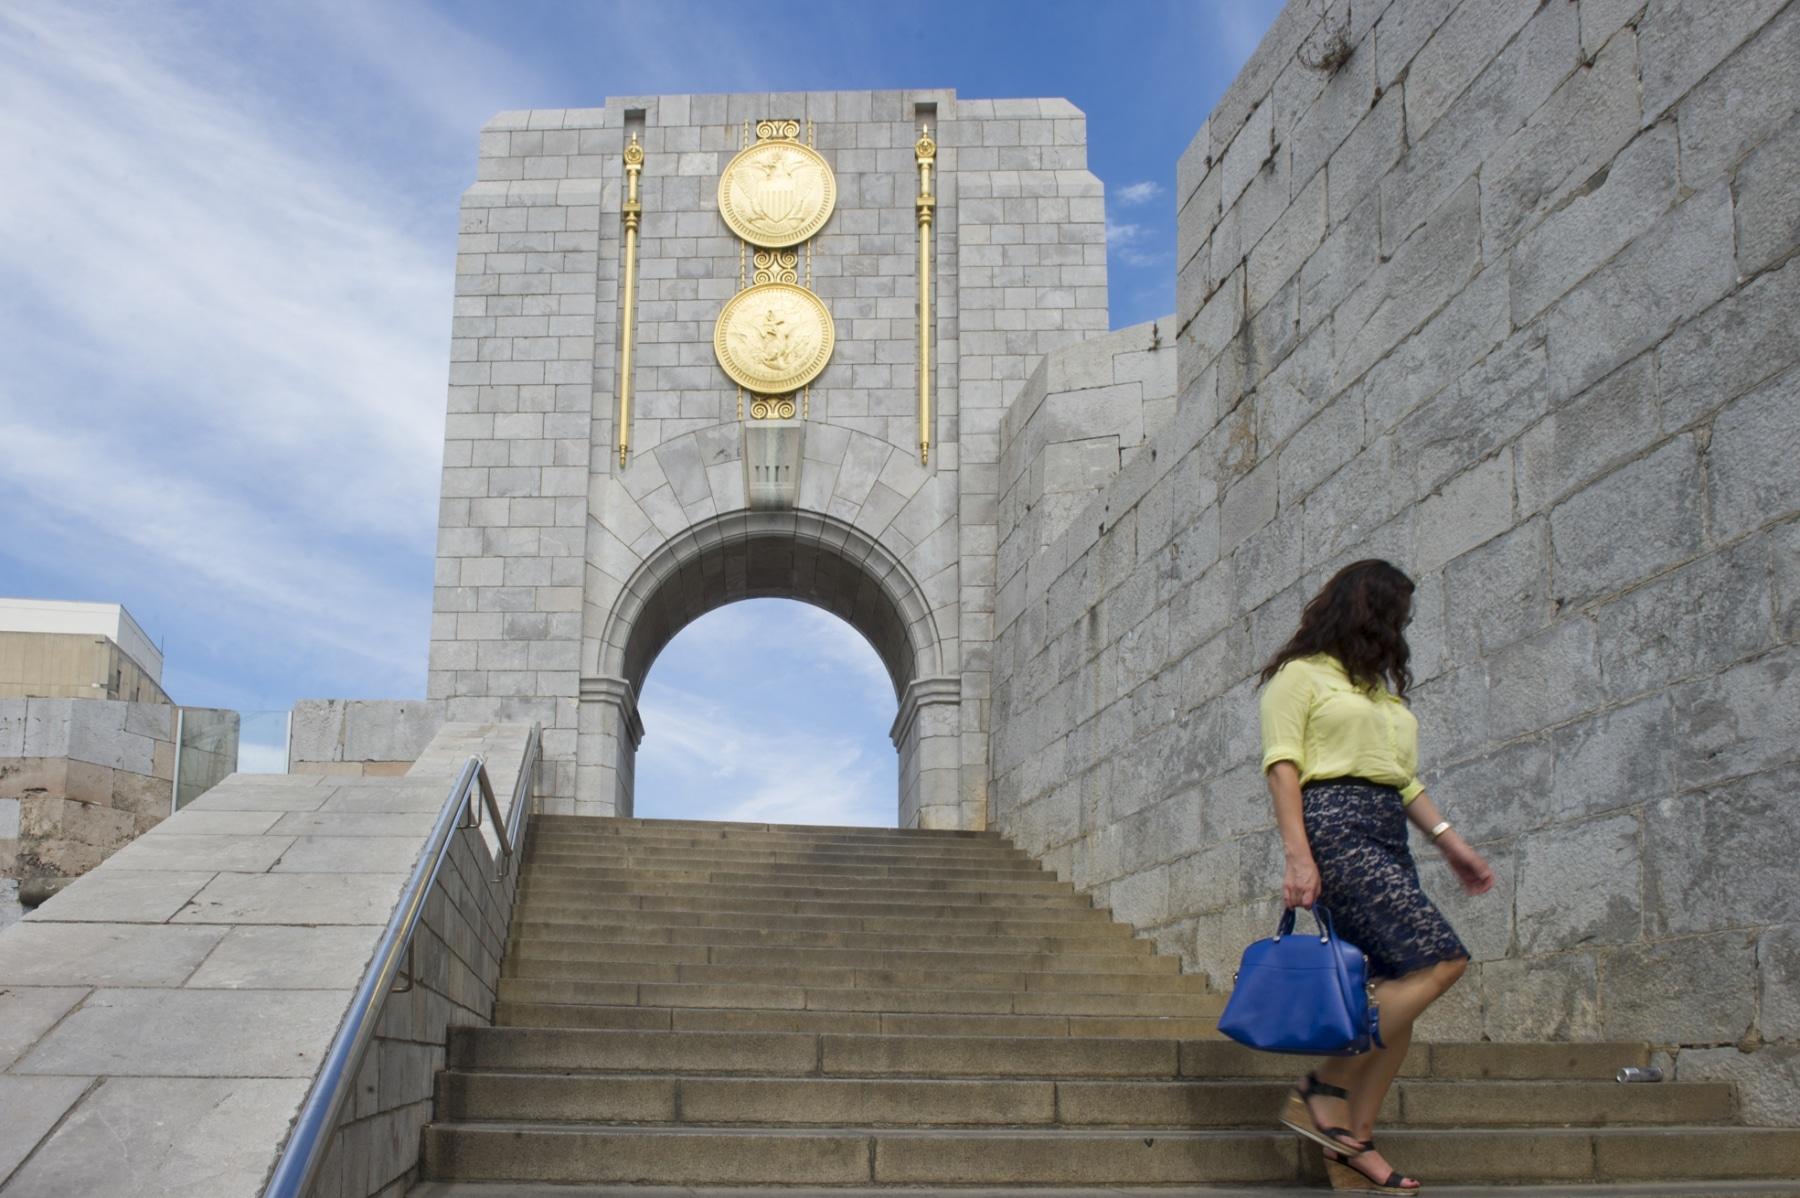 memorial-en-honor-a-los-cados-estadounidenses-en-gibraltar-durante-la-i-guerra-mundial_22714086786_o